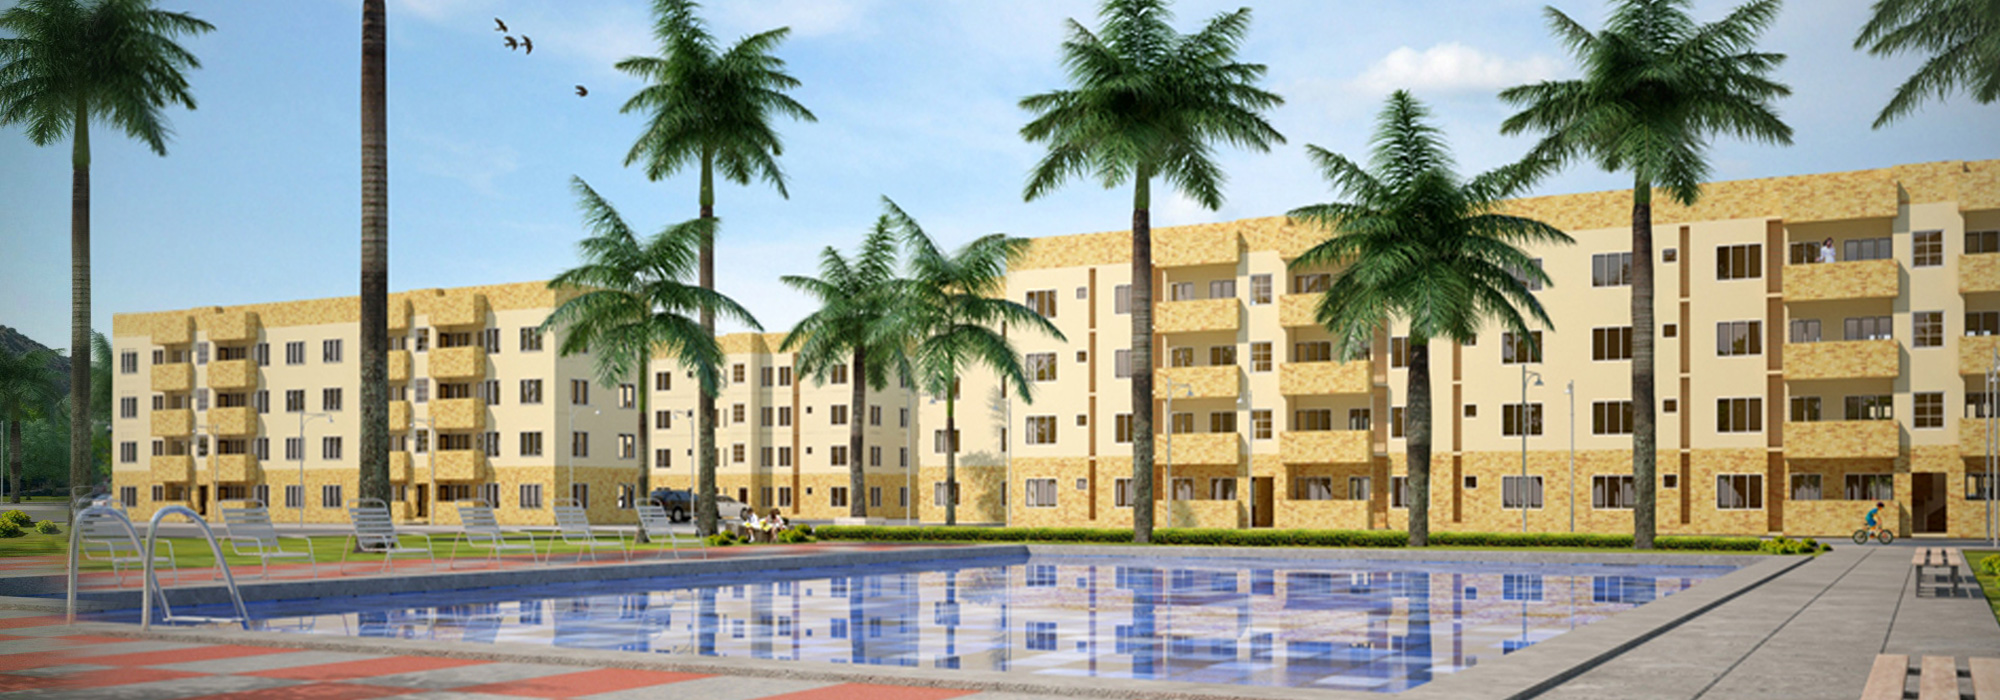 Hannah Gardens Beach Condo, Badagry Nigeria